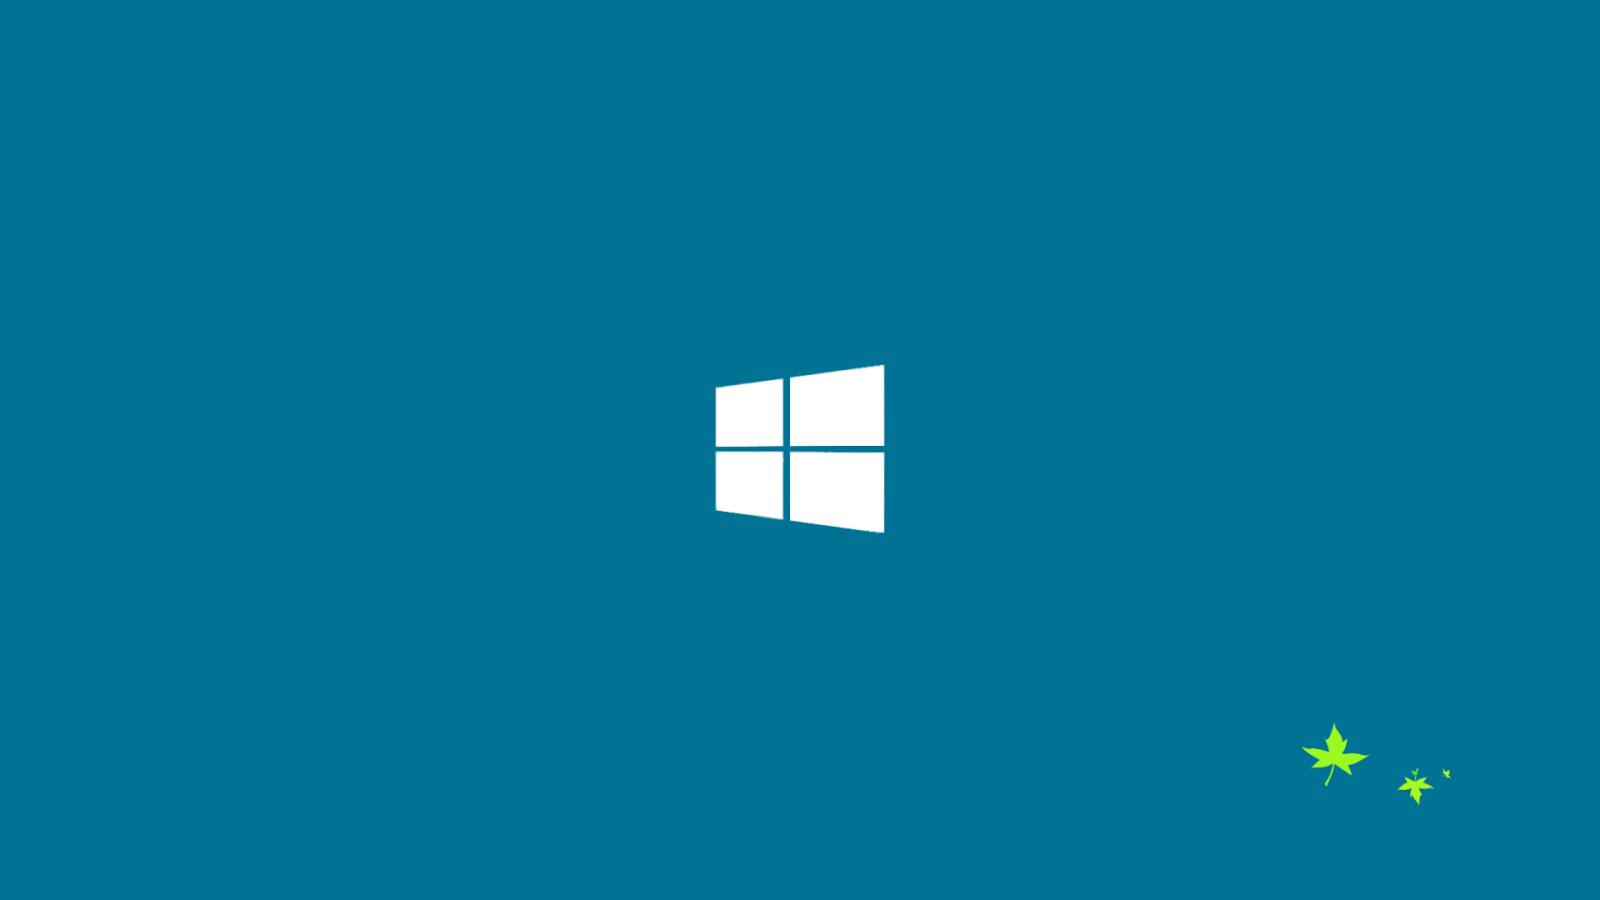 Images hd windows 8 1 wallpaper hd - Windows 8 1 wallpaper hd nature ...